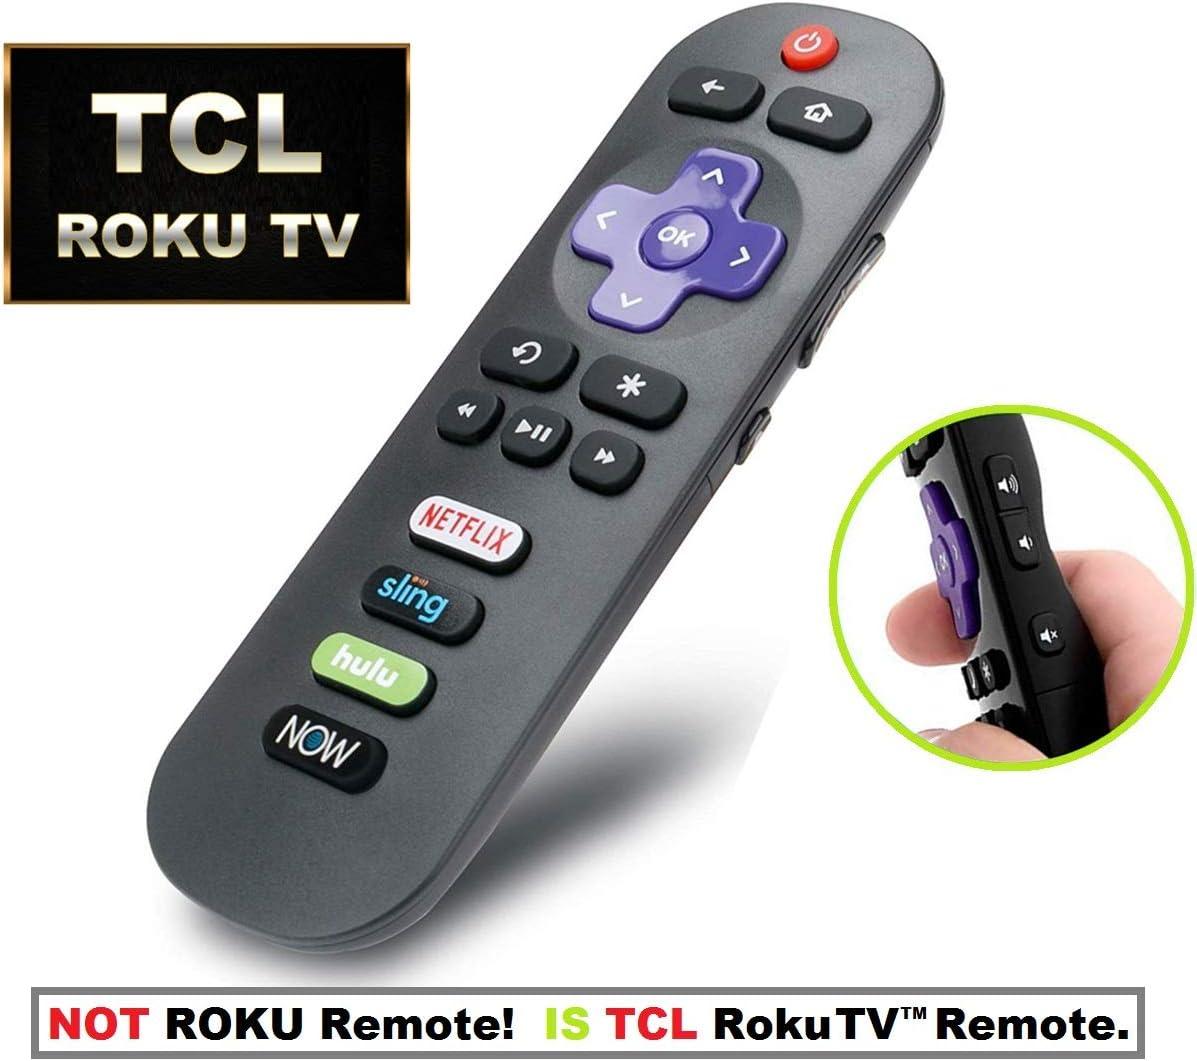 IKU-GRO9 - Mando a Distancia de Repuesto para televisor TCL ROKU ...